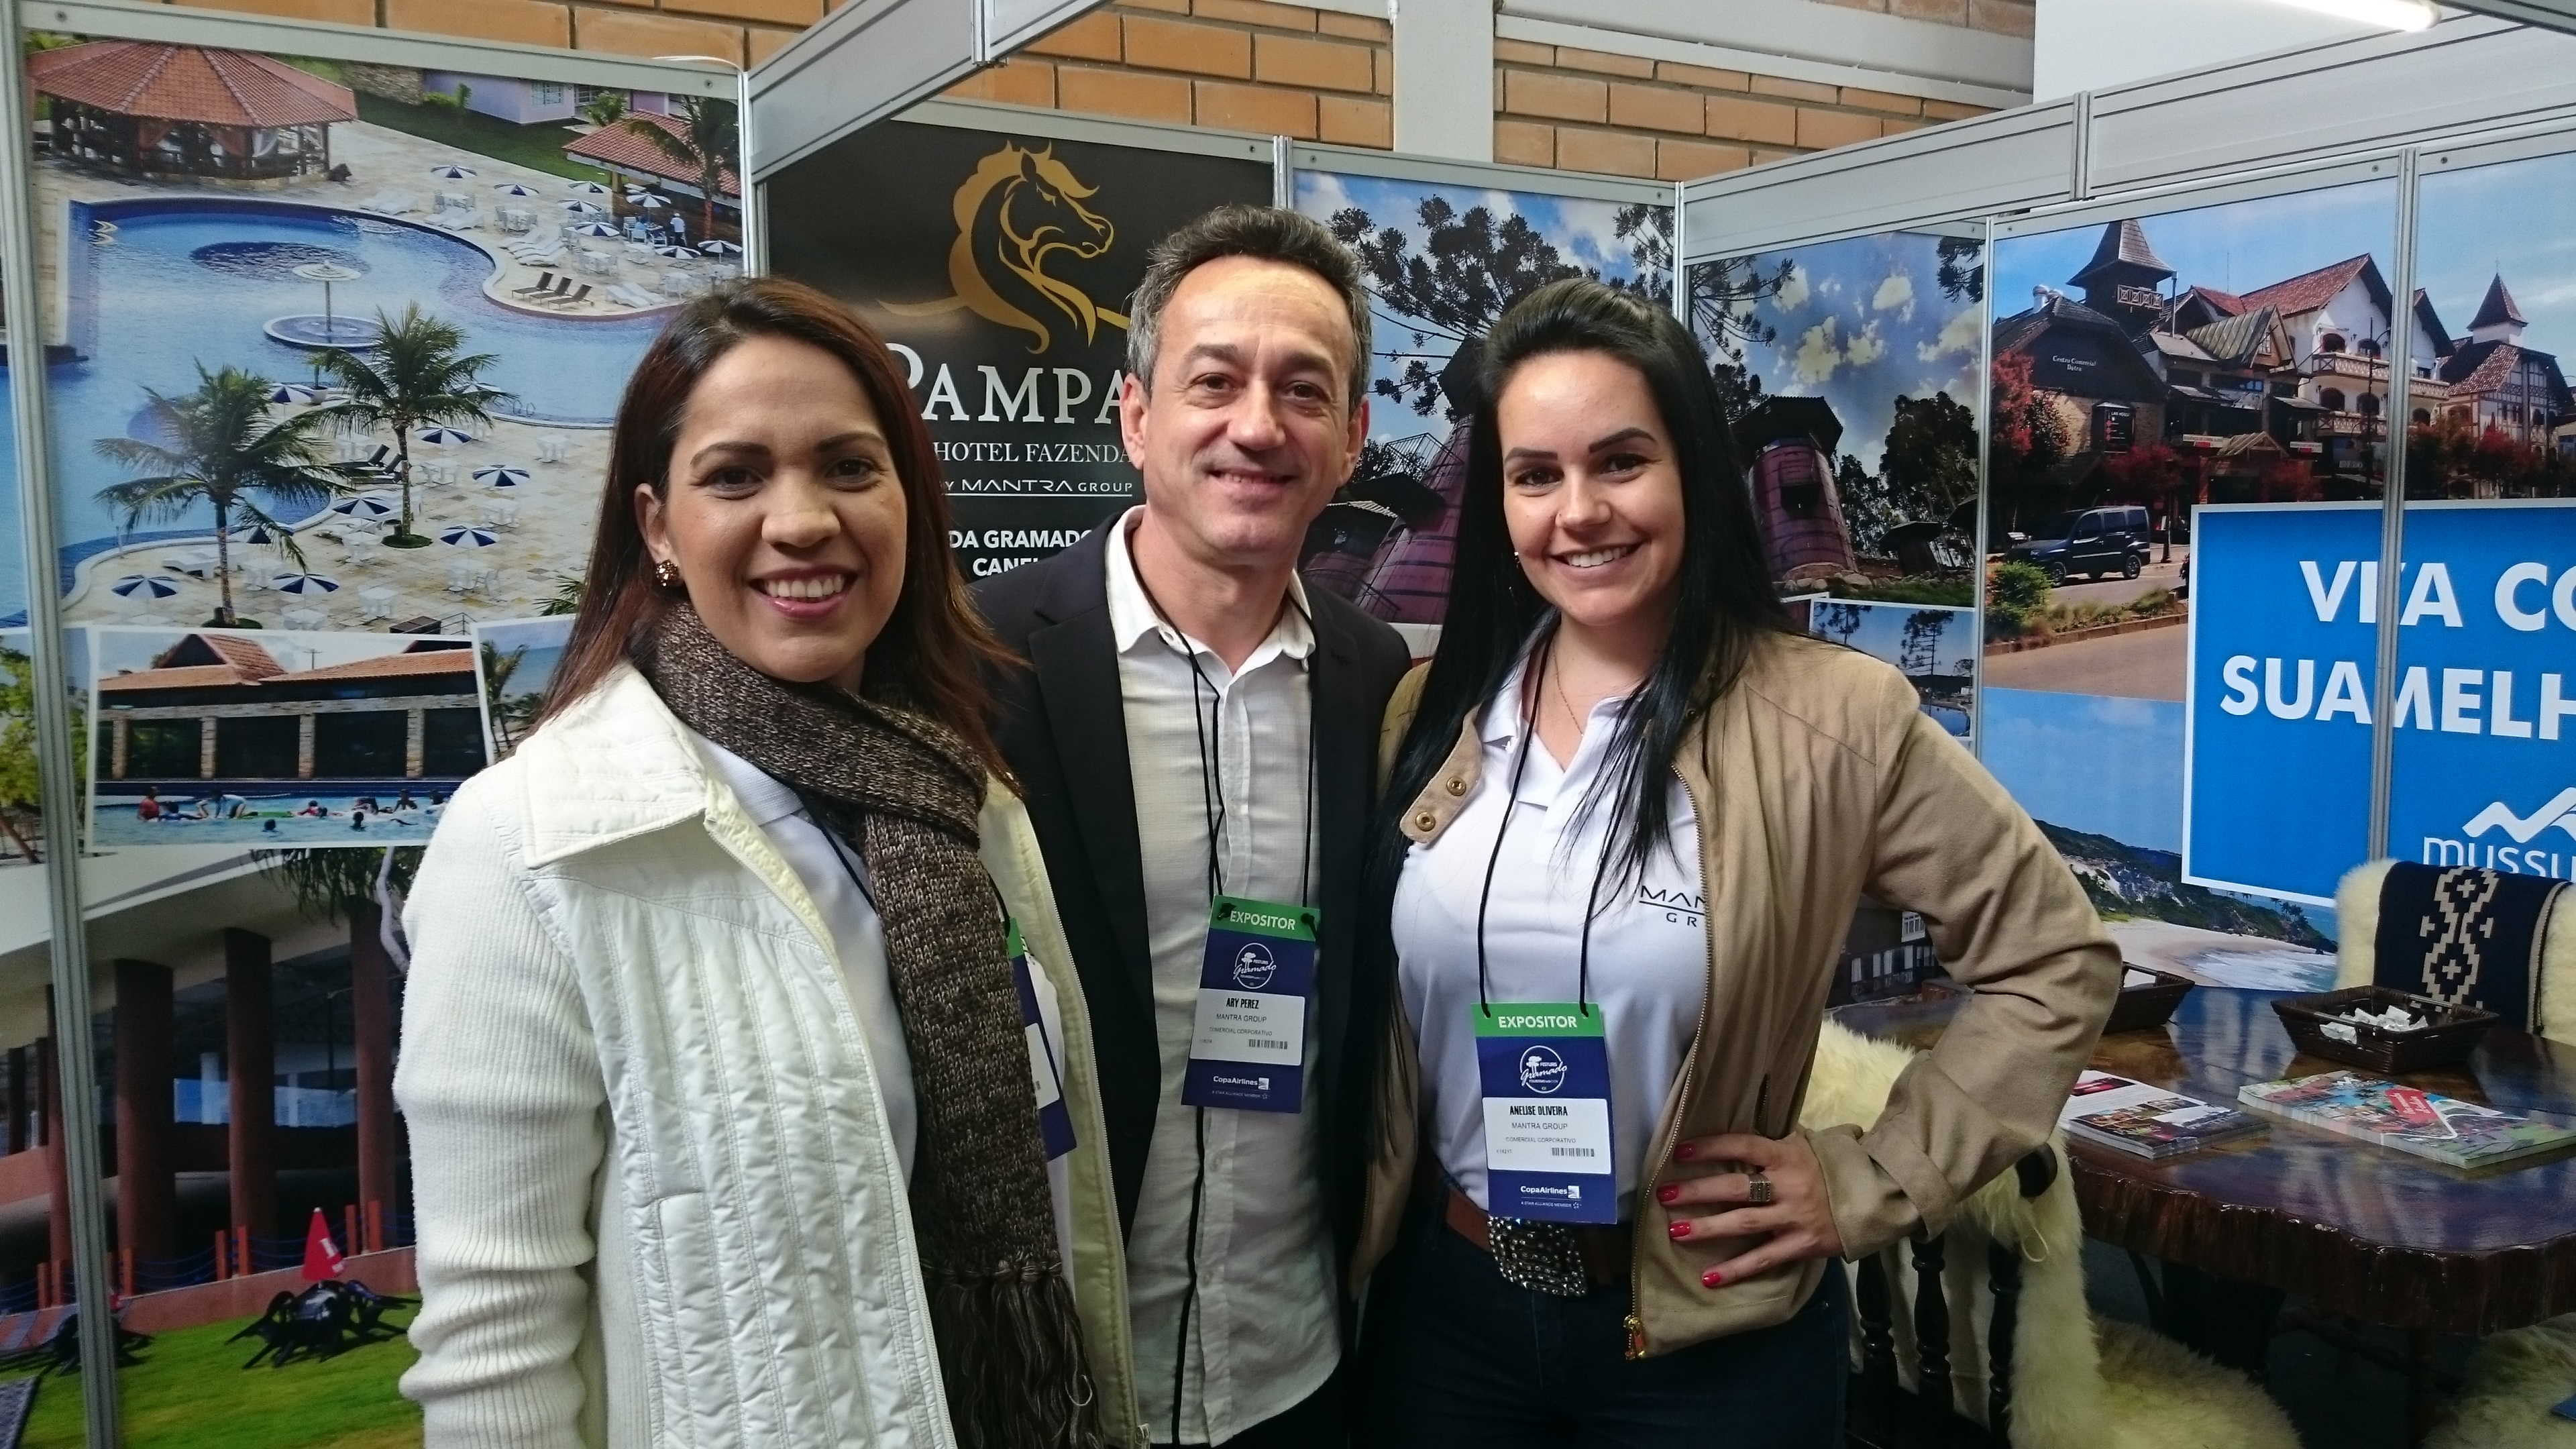 Waléria Agripino, Ary Perez e Anelise Oliveira, do Mantra Group